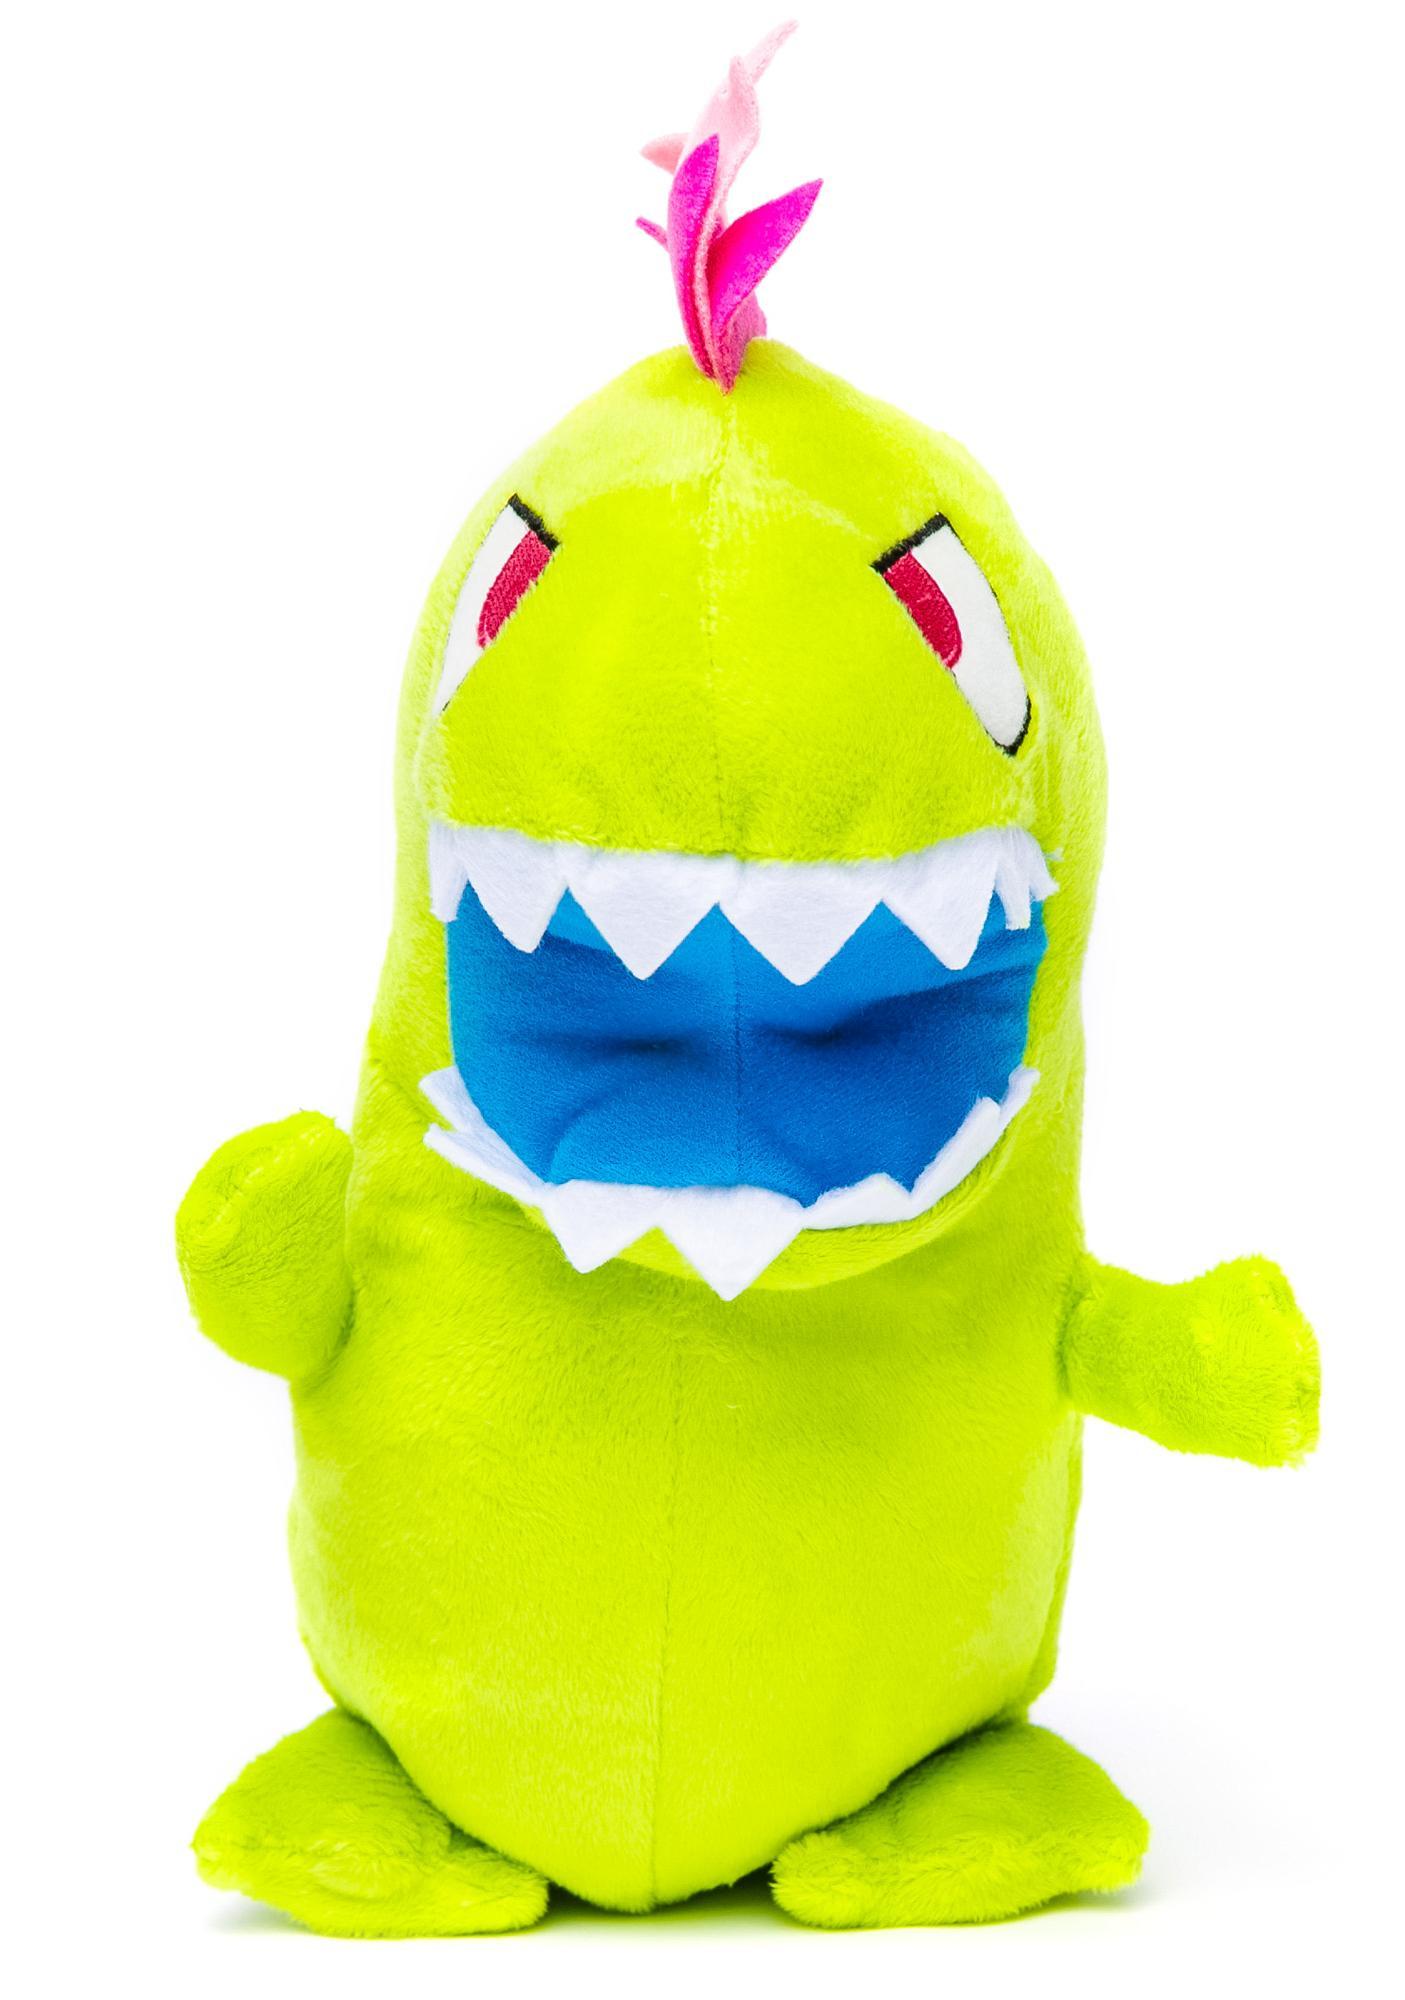 Tokidoki Kaiju Plush